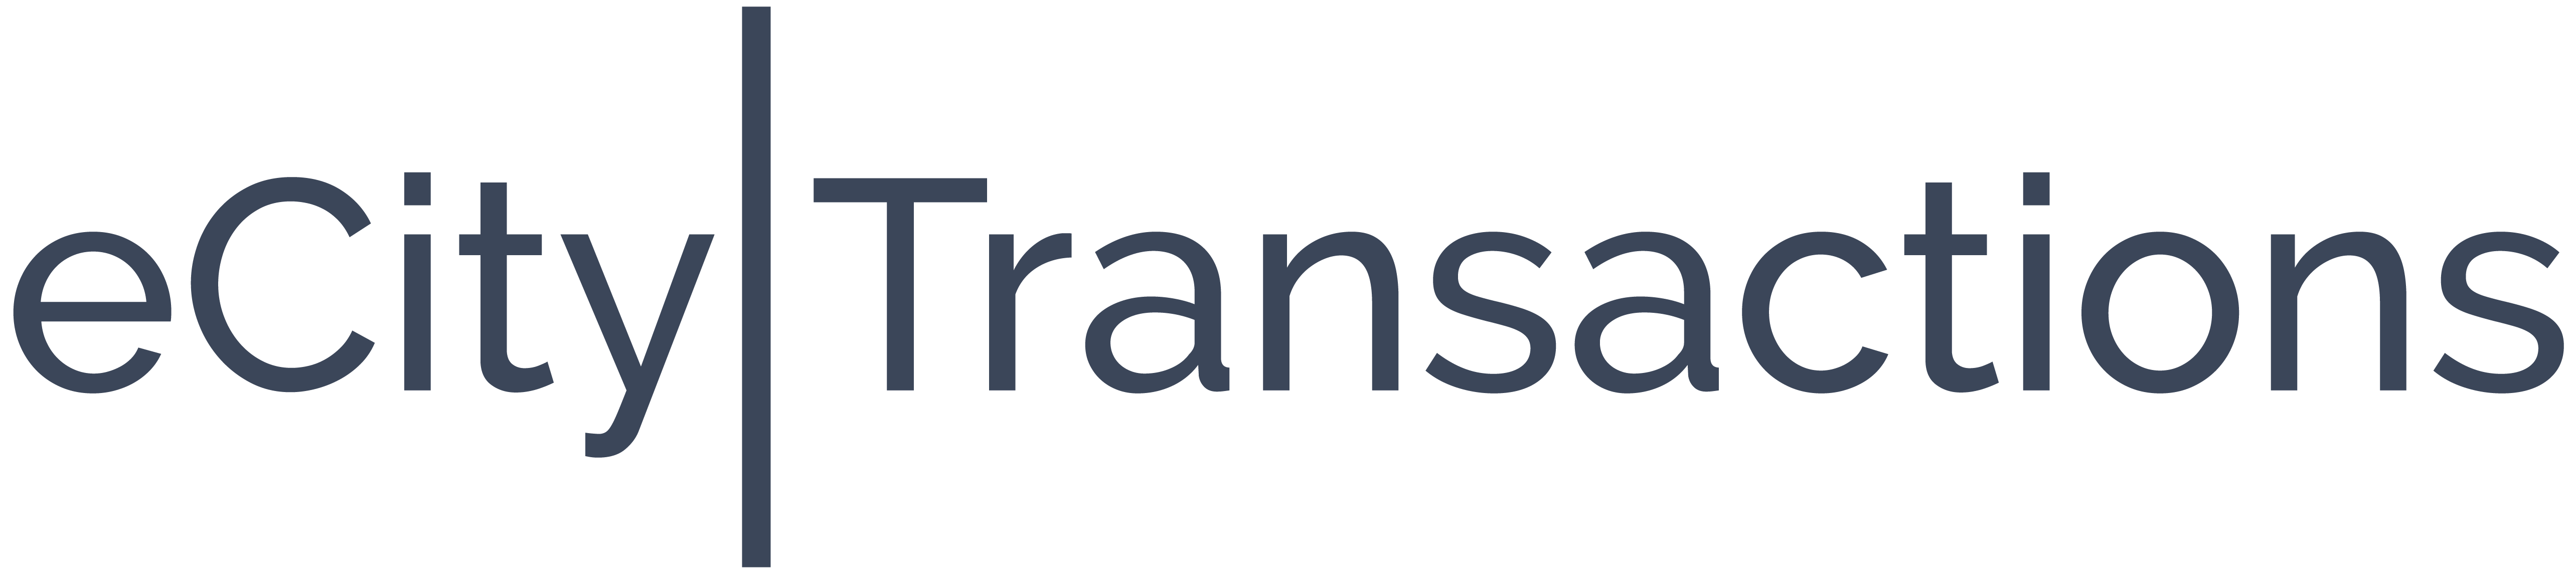 eCity Transactions